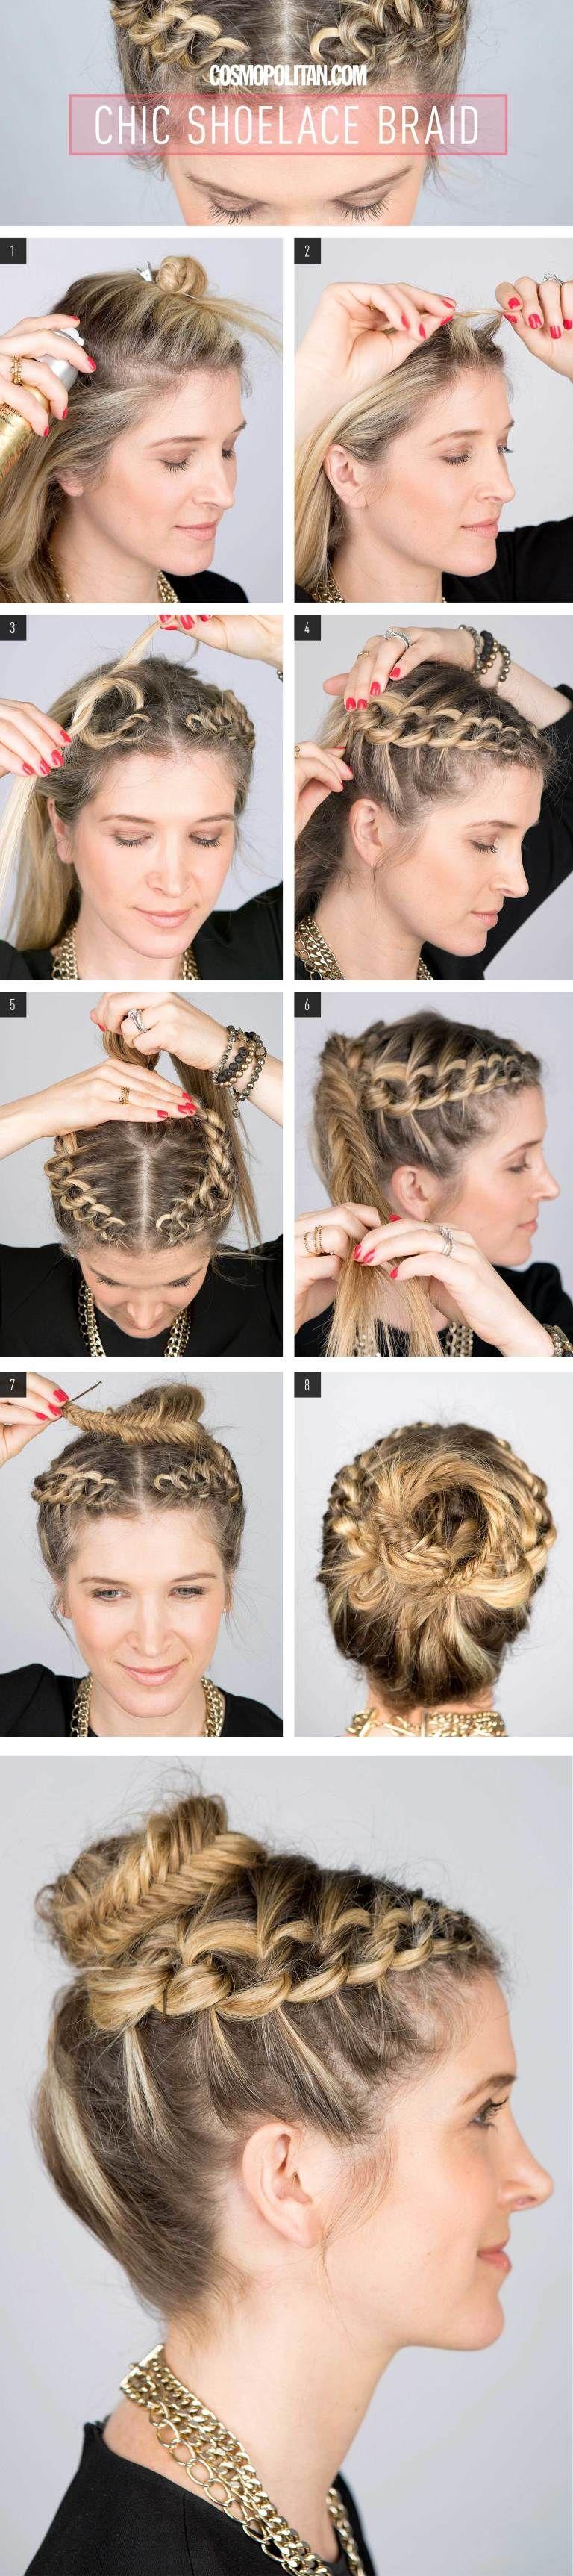 #braid #tutorial #howto #DIY #hairstyle #hairdo